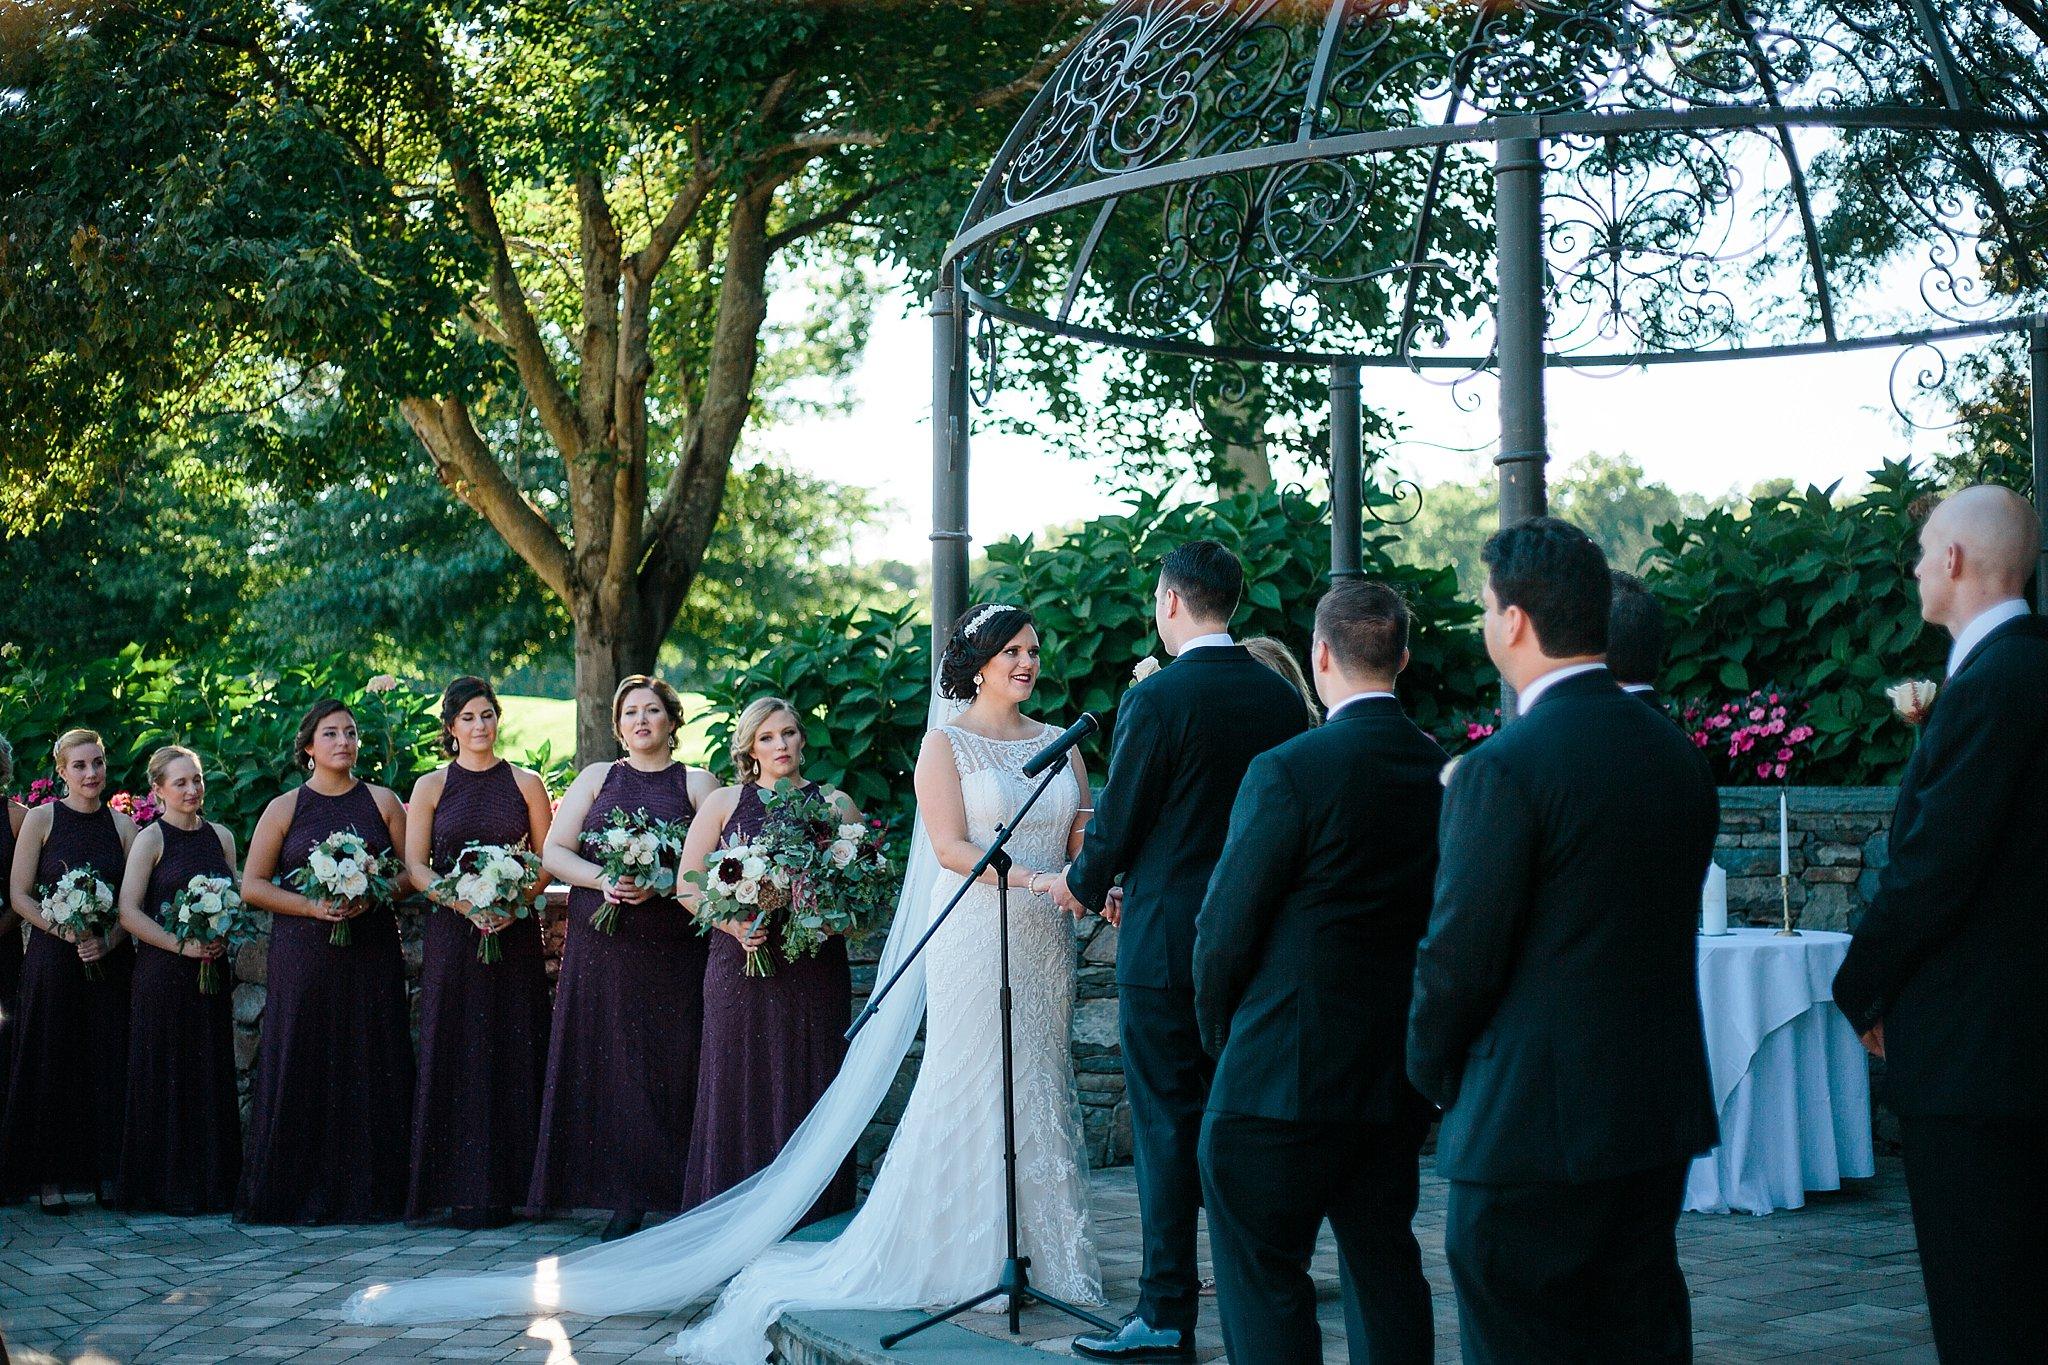 West Hills Country Club Wedding Gatsby Wedding Roaring Twenties Wedding Hudson Valley Wedding Photographer Sweet Alice Photography52.jpg